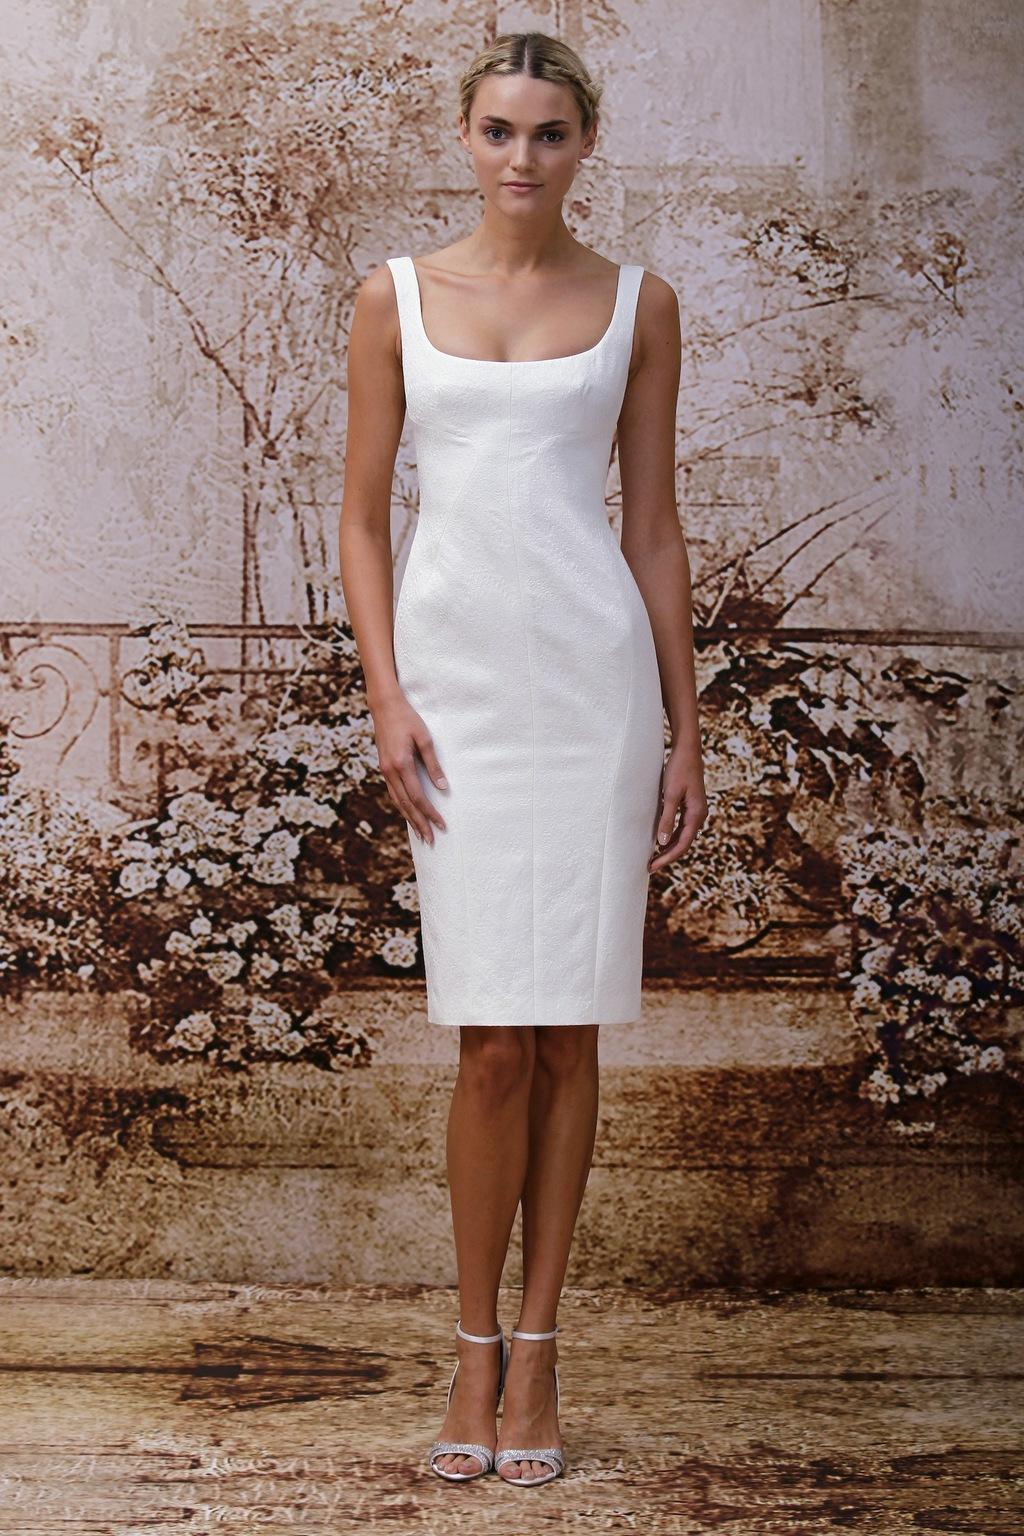 Wedding-dress-by-monique-lhuillier-fall-2014-bridal-look-2.full